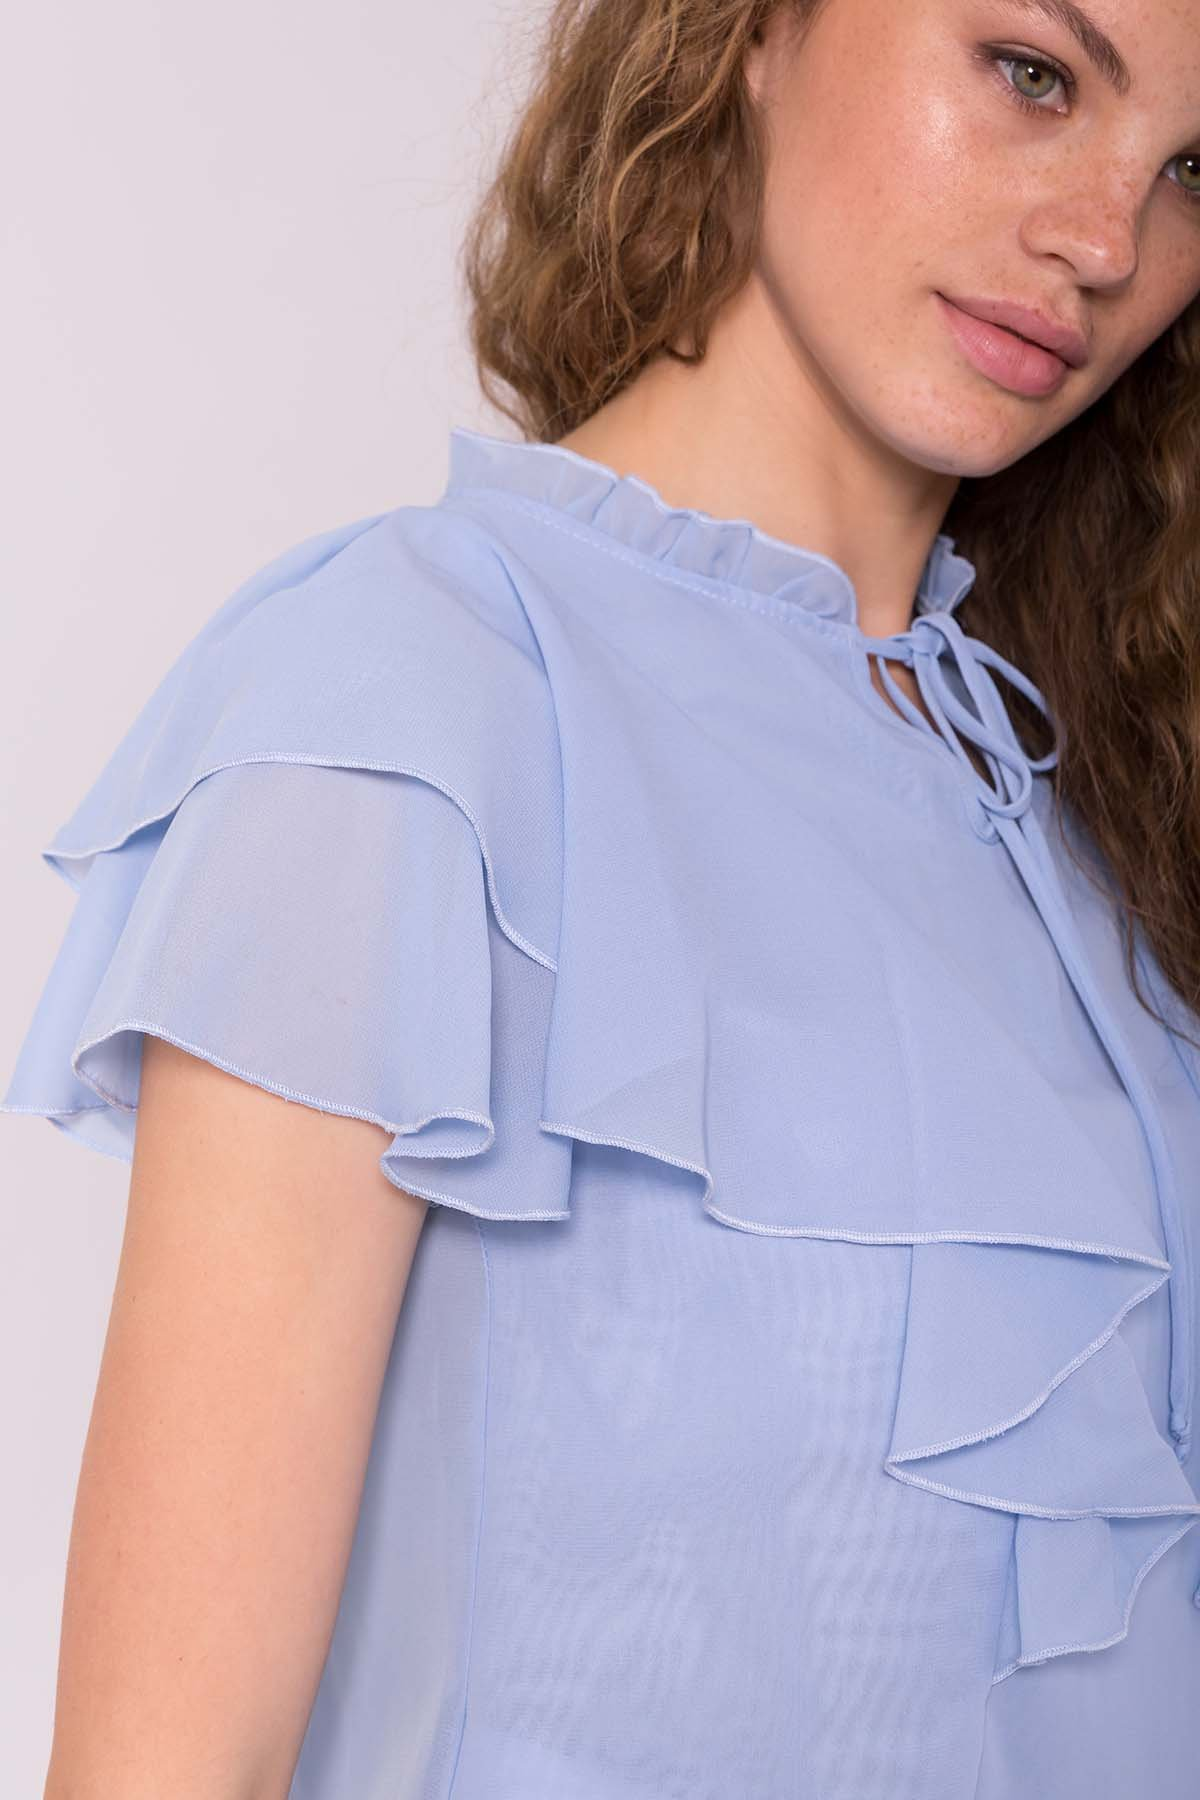 Блуза Дайан 7235 АРТ. 42833 Цвет: Голубой - фото 3, интернет магазин tm-modus.ru